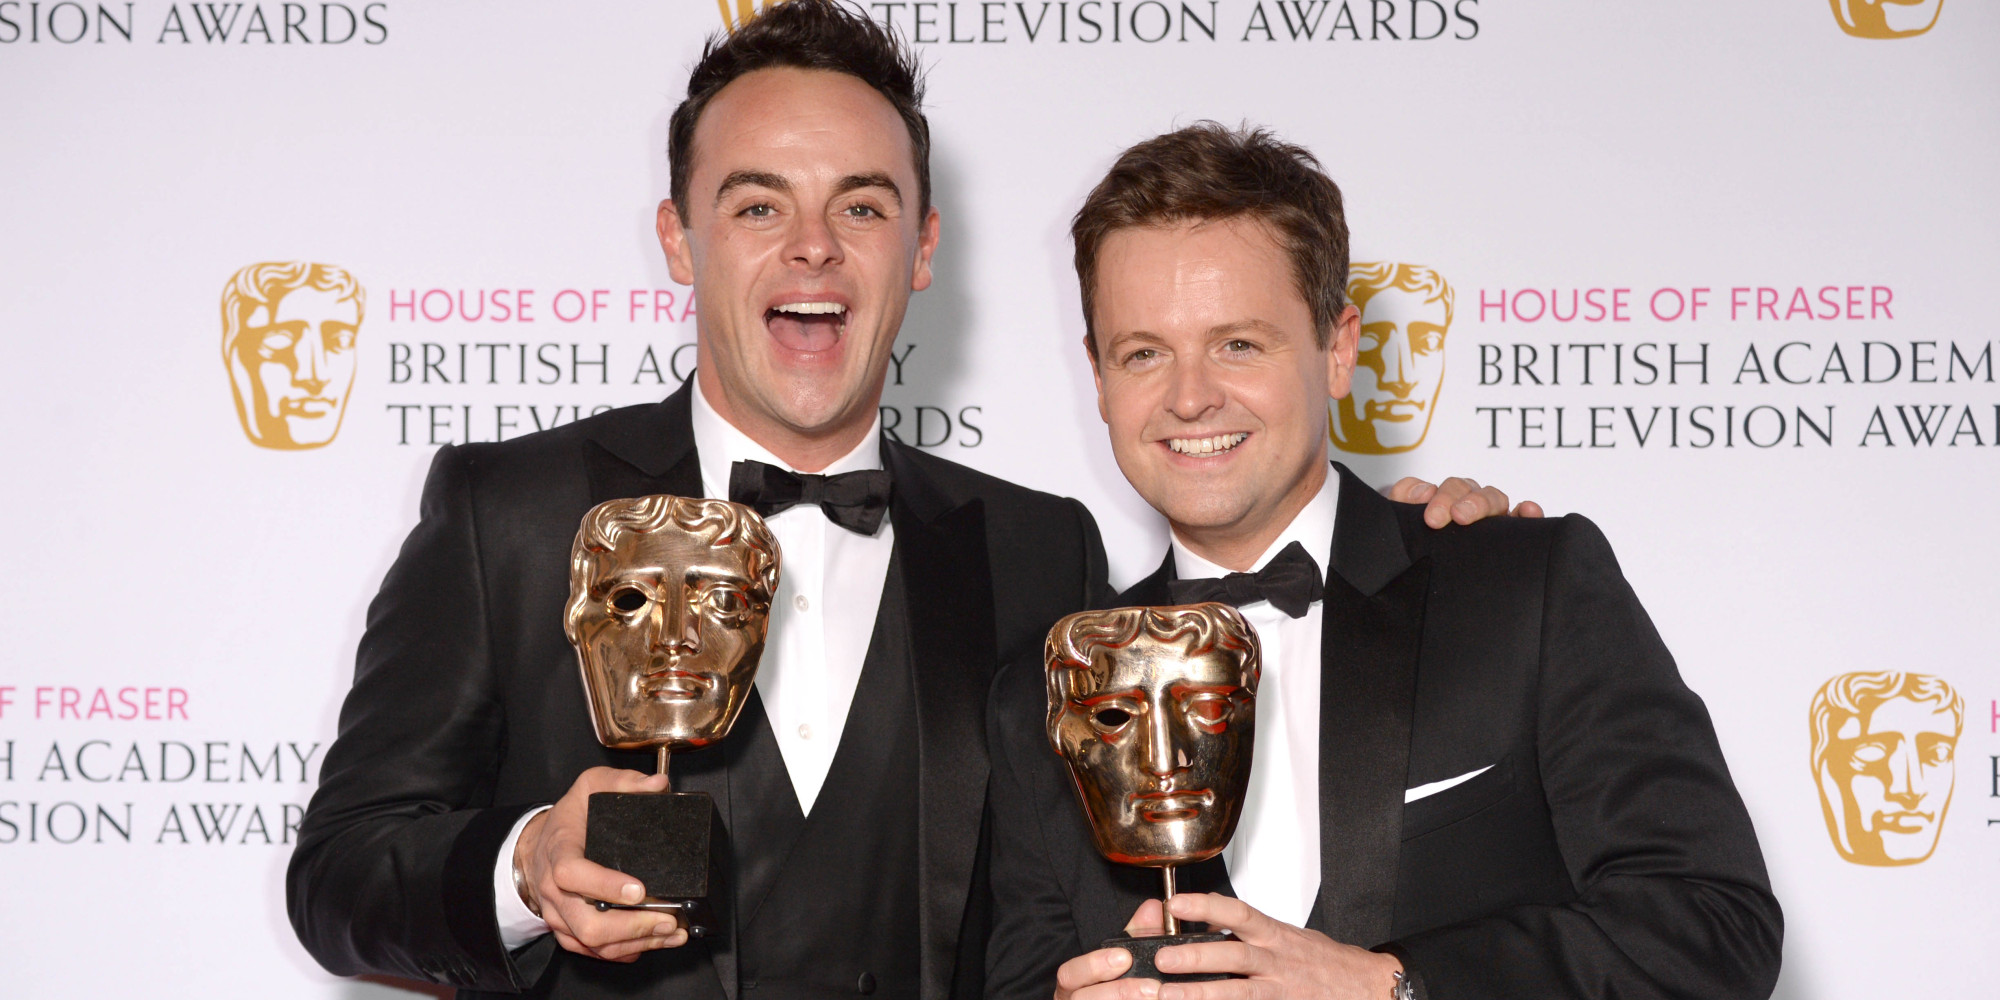 Bafta Awards: BAFTA TV Awards Winners: Benedict Cumberbatch Loses Out